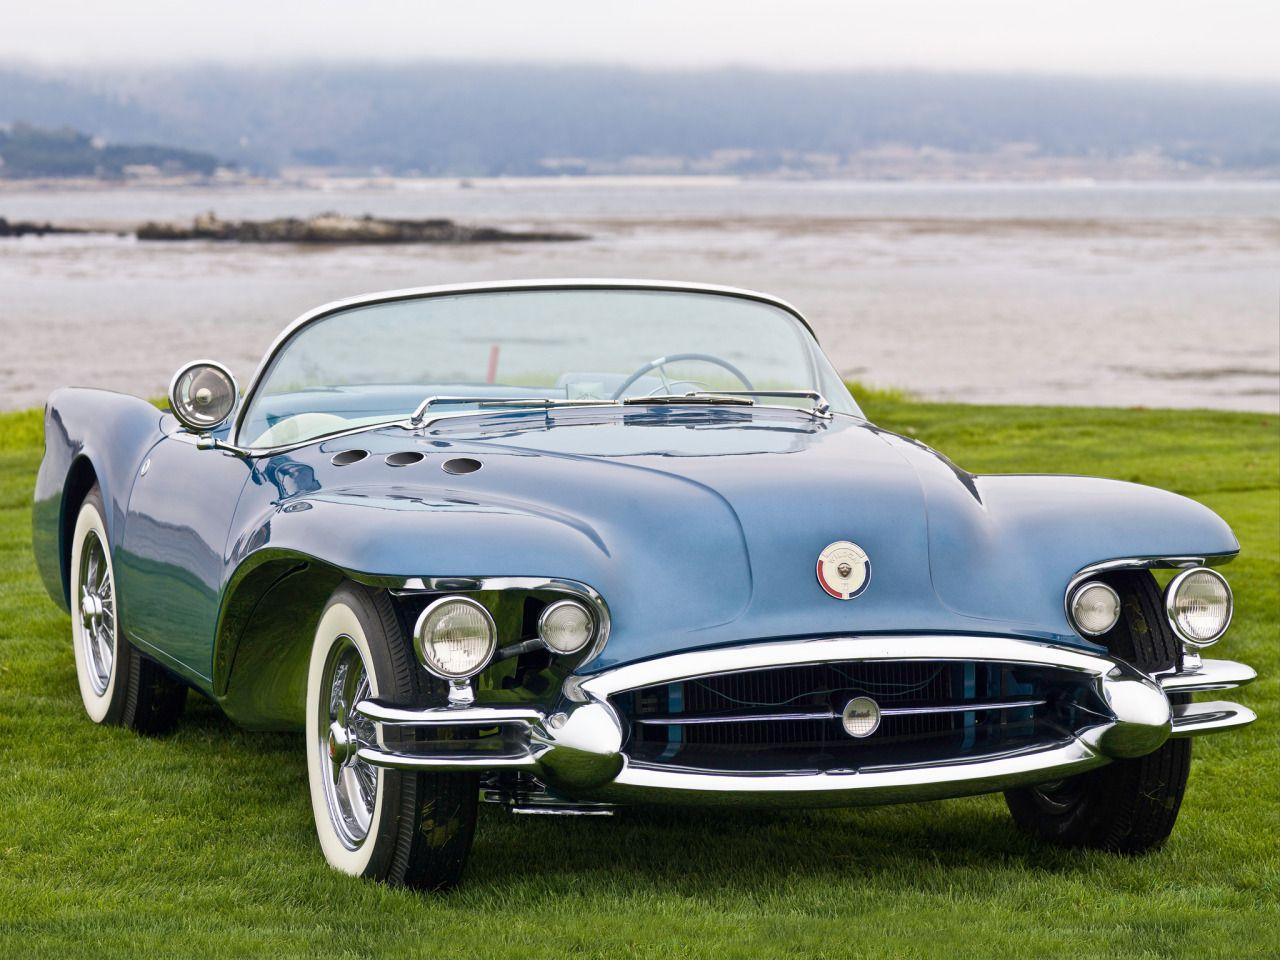 1956 chevrolet belair mjc classic cars pristine - Desoto Adventurer Convertible 1959 Cabrio 50 S Pinterest Convertible And Cars